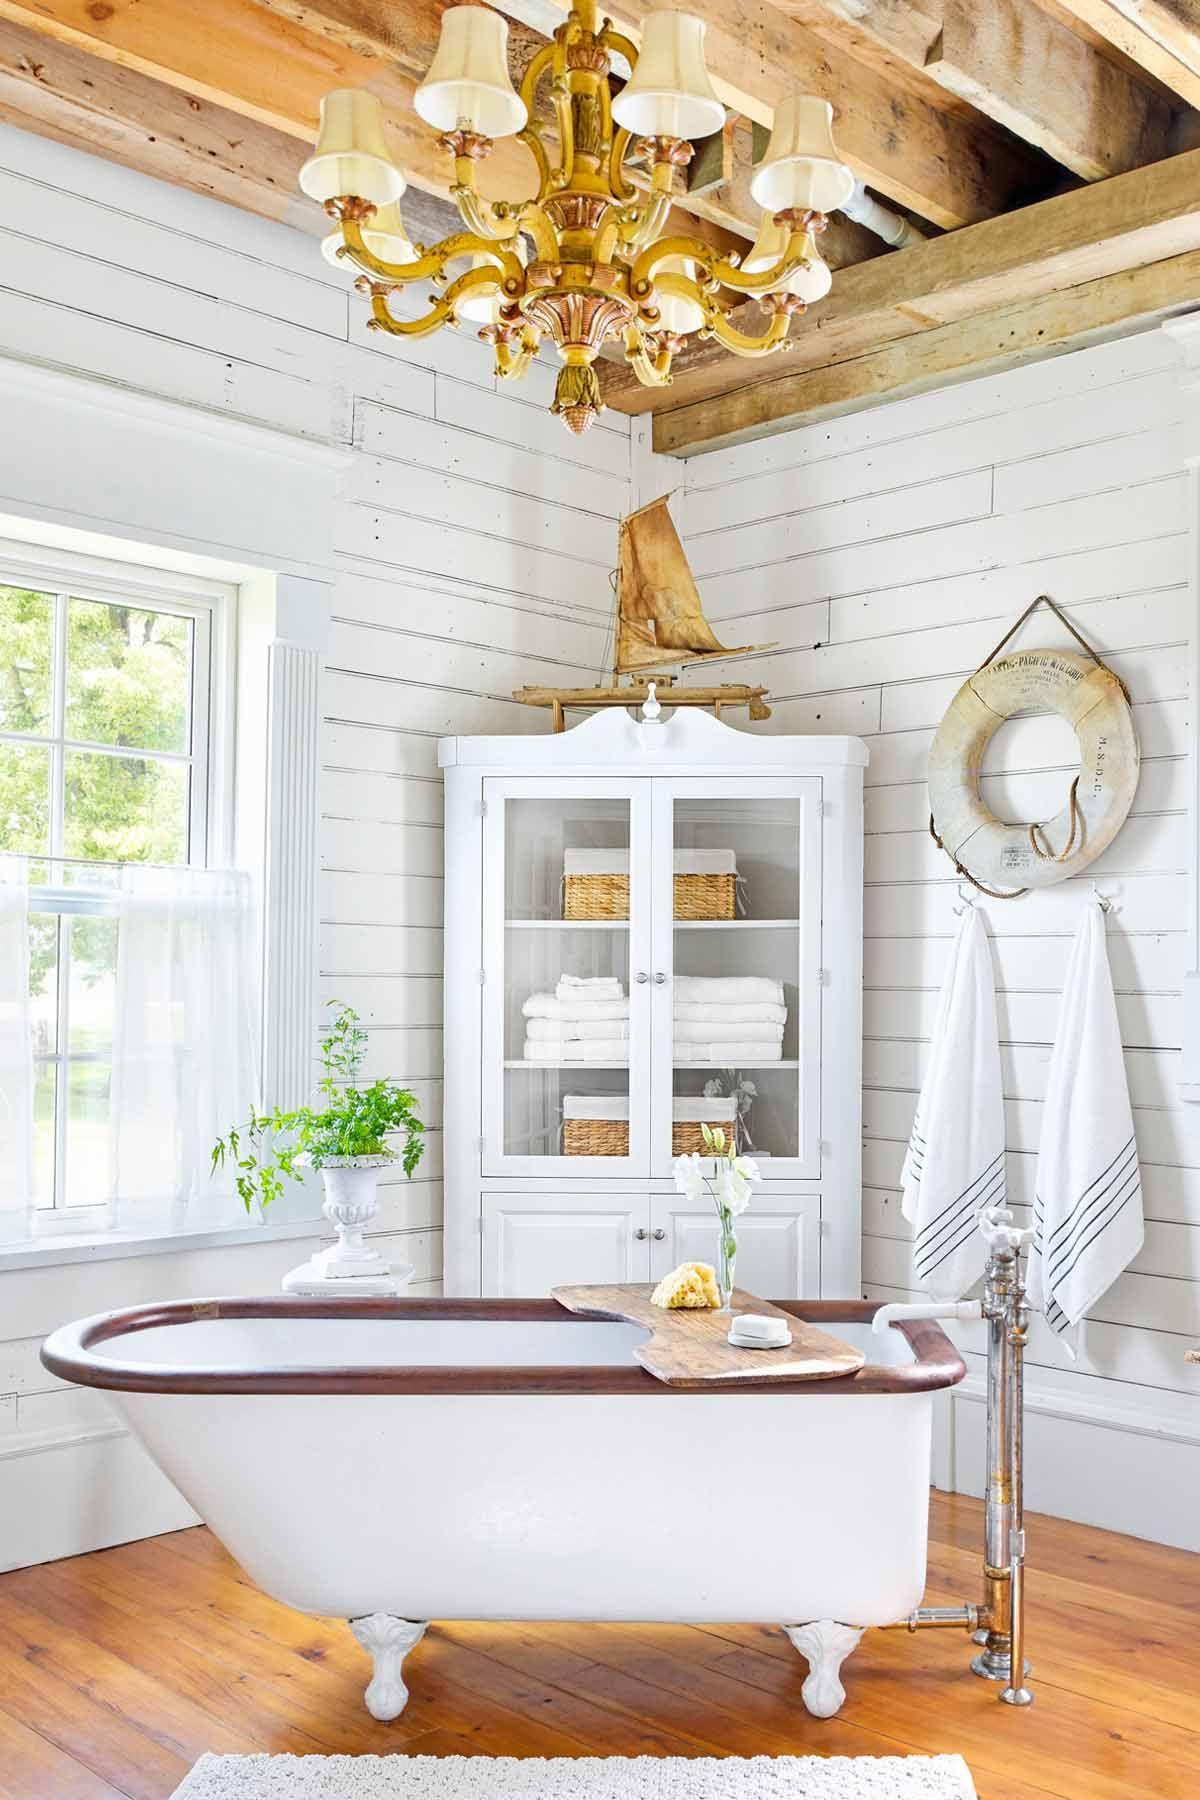 37 Rustic Bathroom Decor Ideas - Rustic Modern Bathroom ... on Rural Bathroom  id=90100